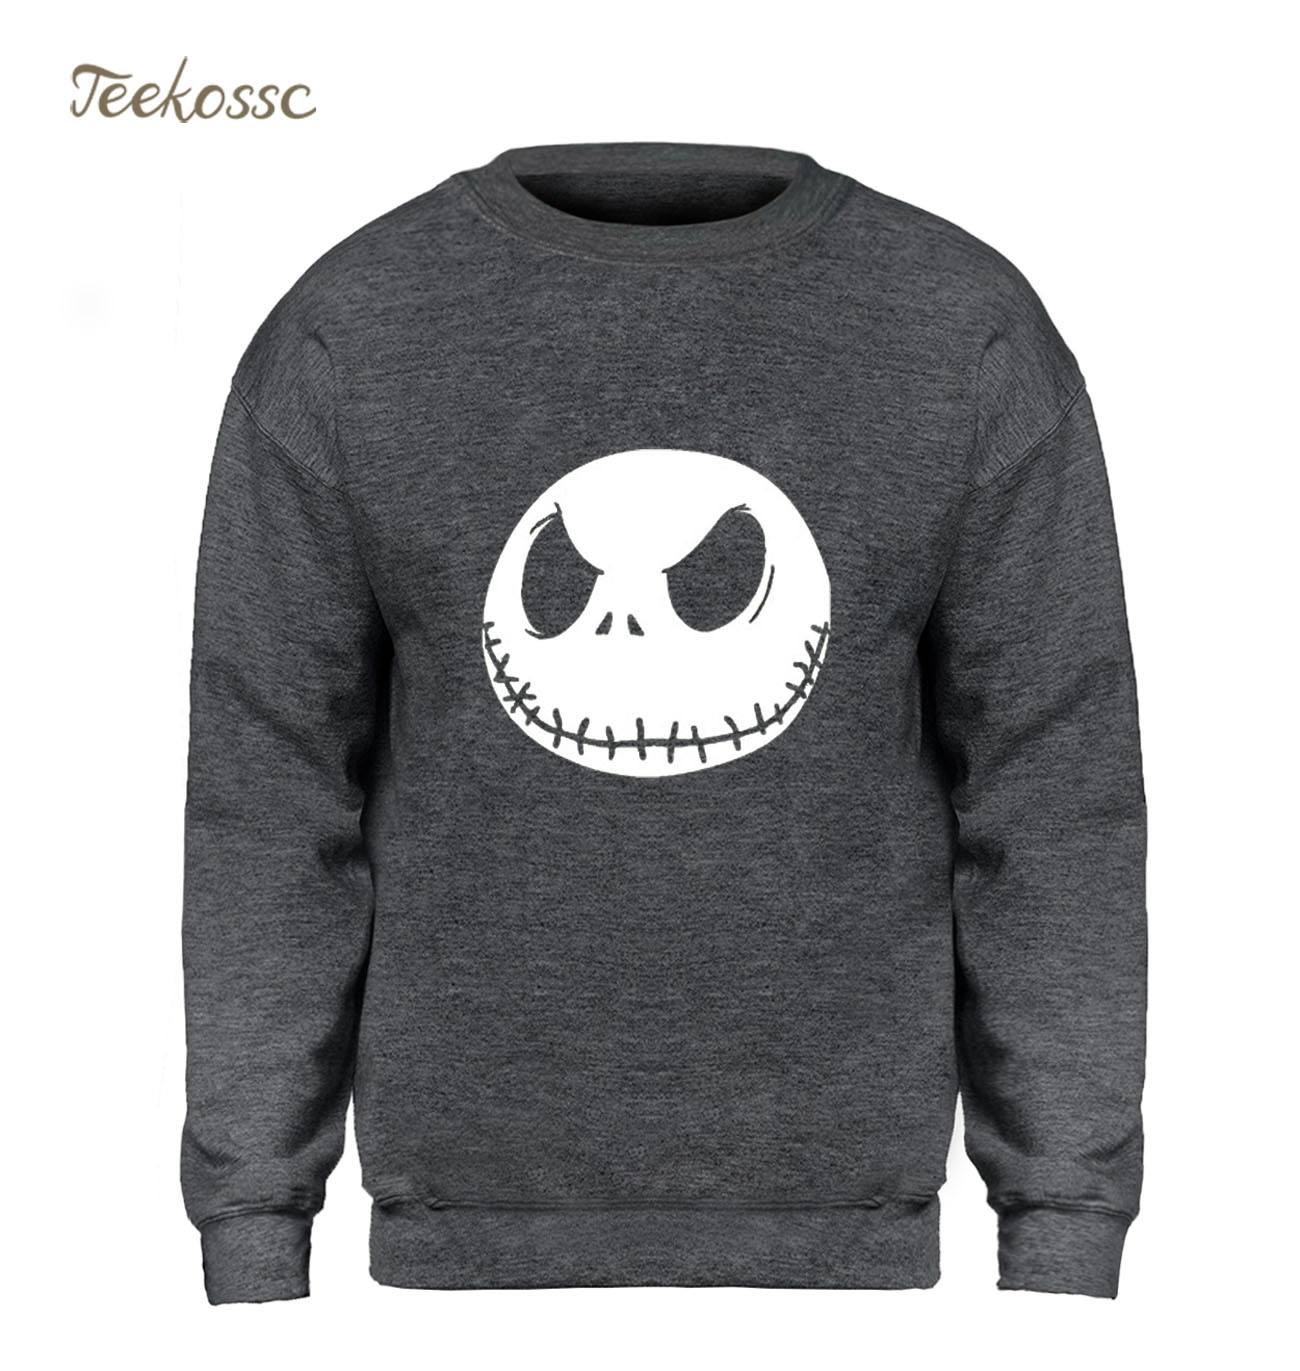 Pumpkin King Skull Hoodie Men The Nightmare Before Christmas Halloween Sweatshirt 2018 Fleece Warm Halloween Gifts Hoodies Homme